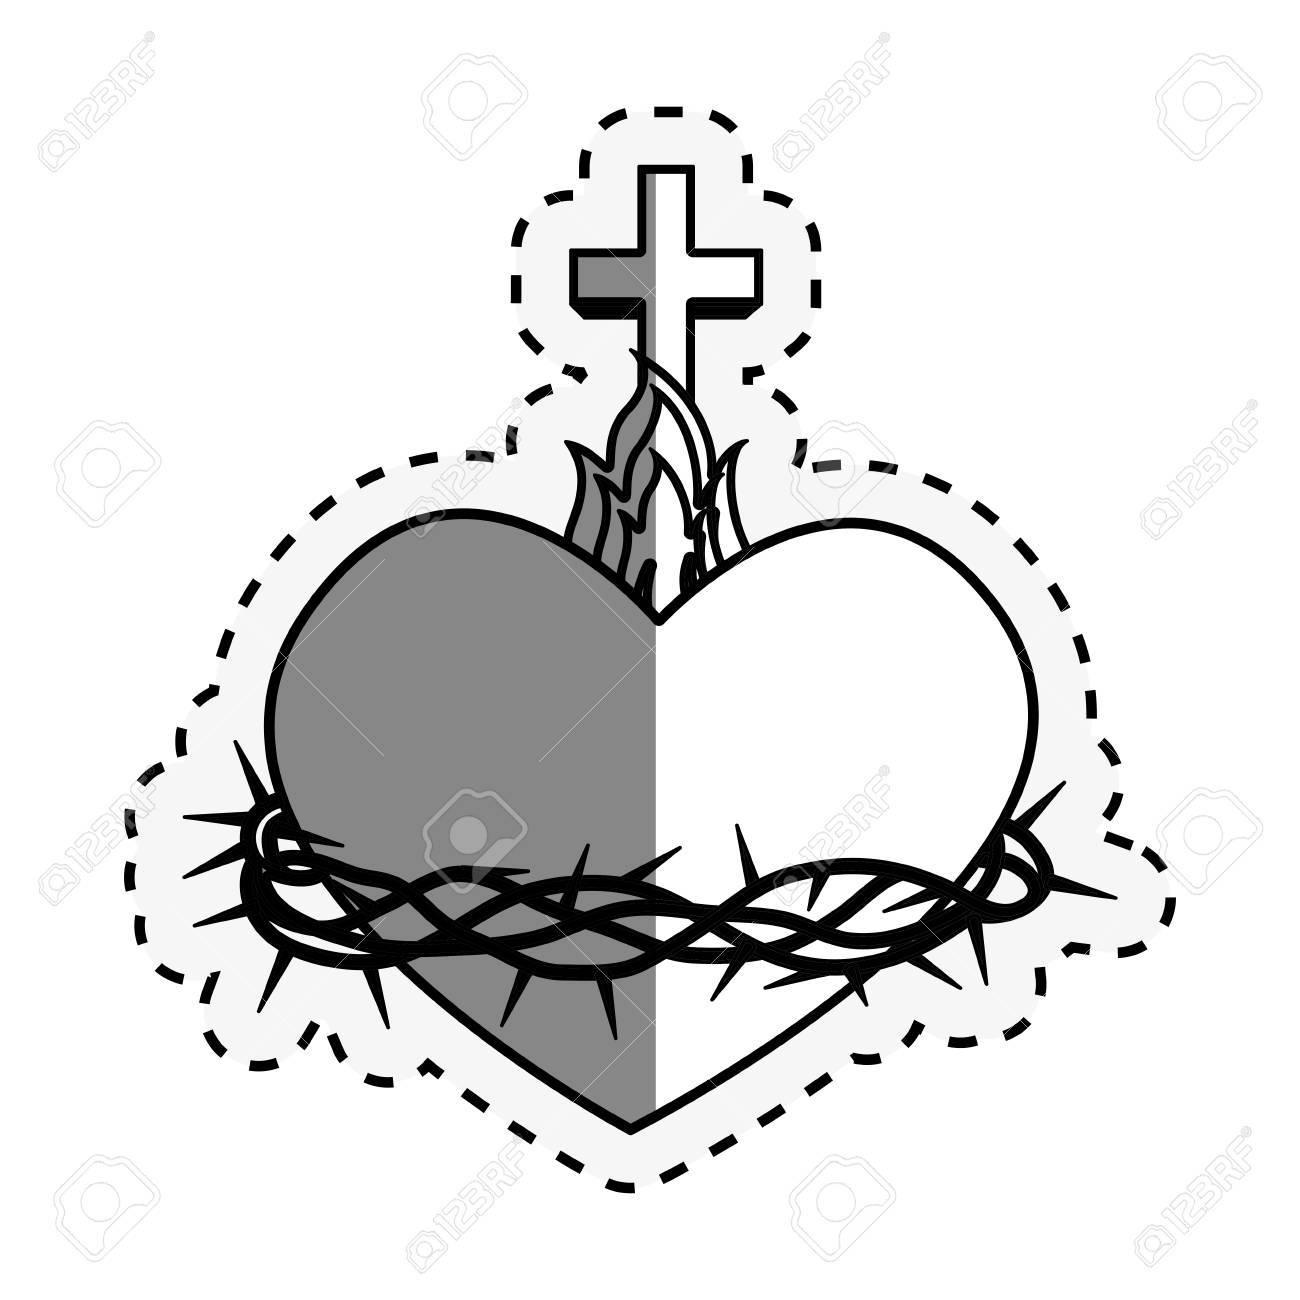 hight resolution of sacred heart of jesus vector illustration design stock vector 66752174